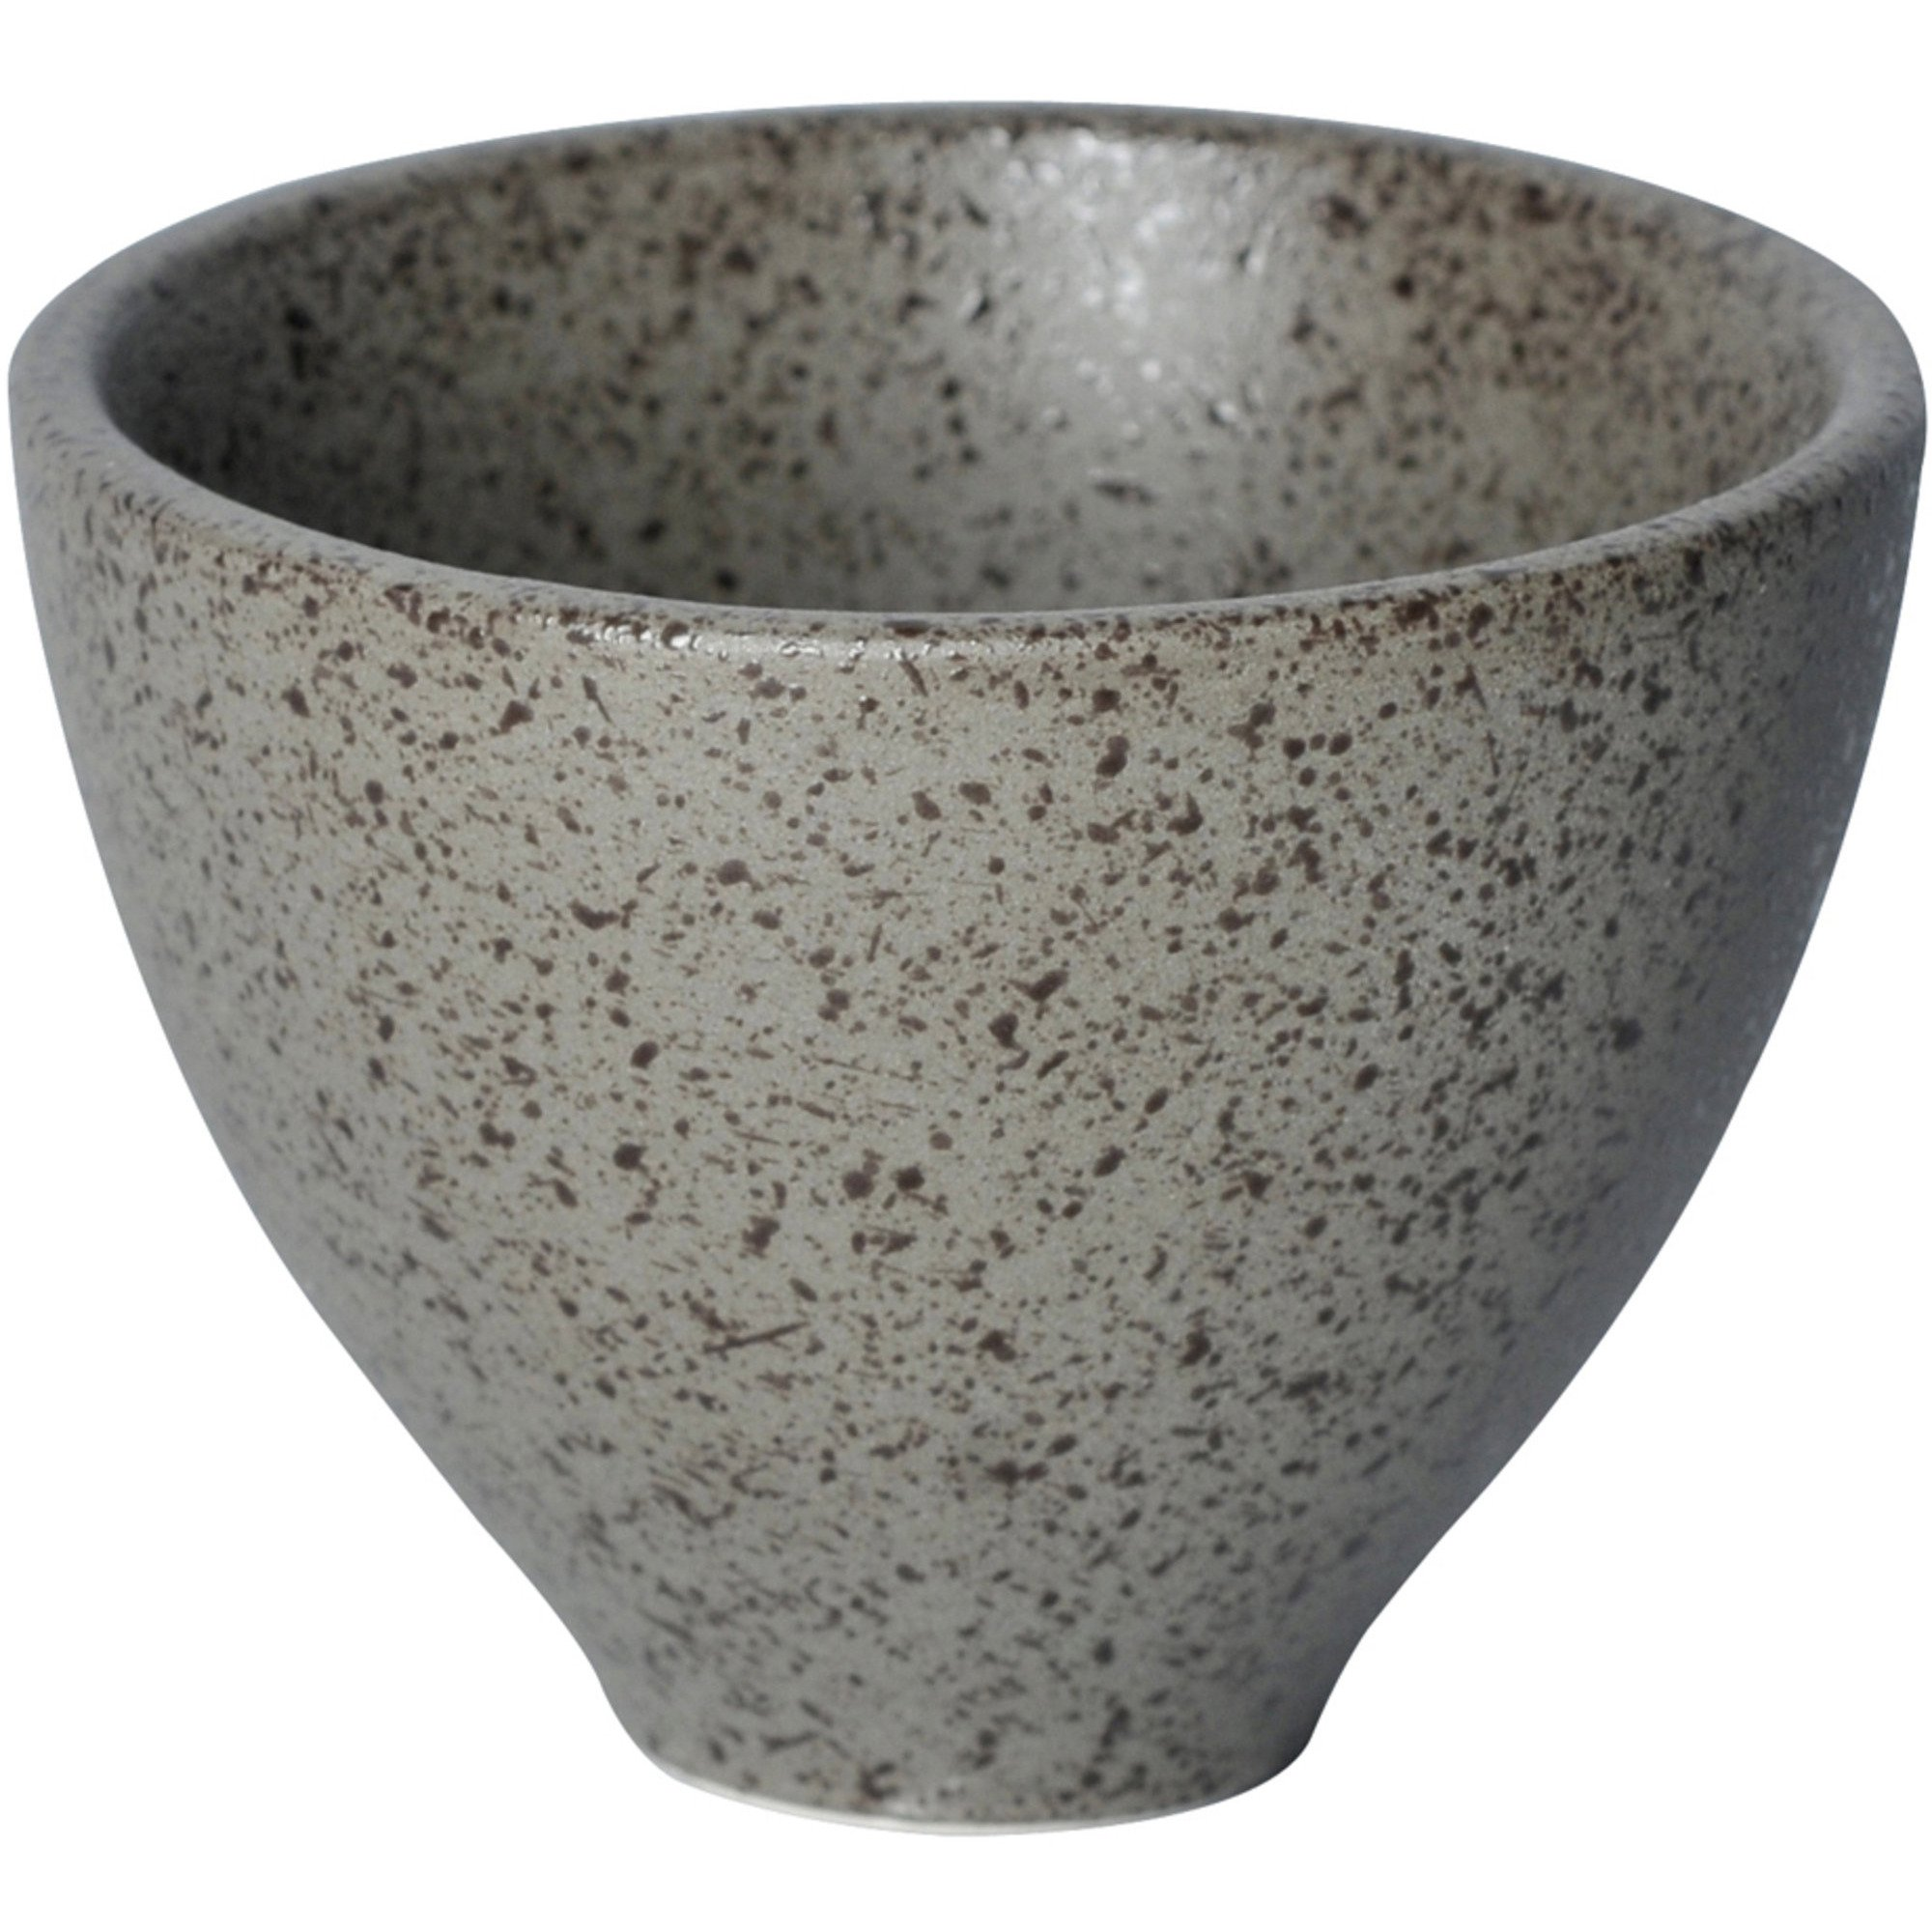 Loveramics Aromakopp Granit 150 ml. 6 st. Floral